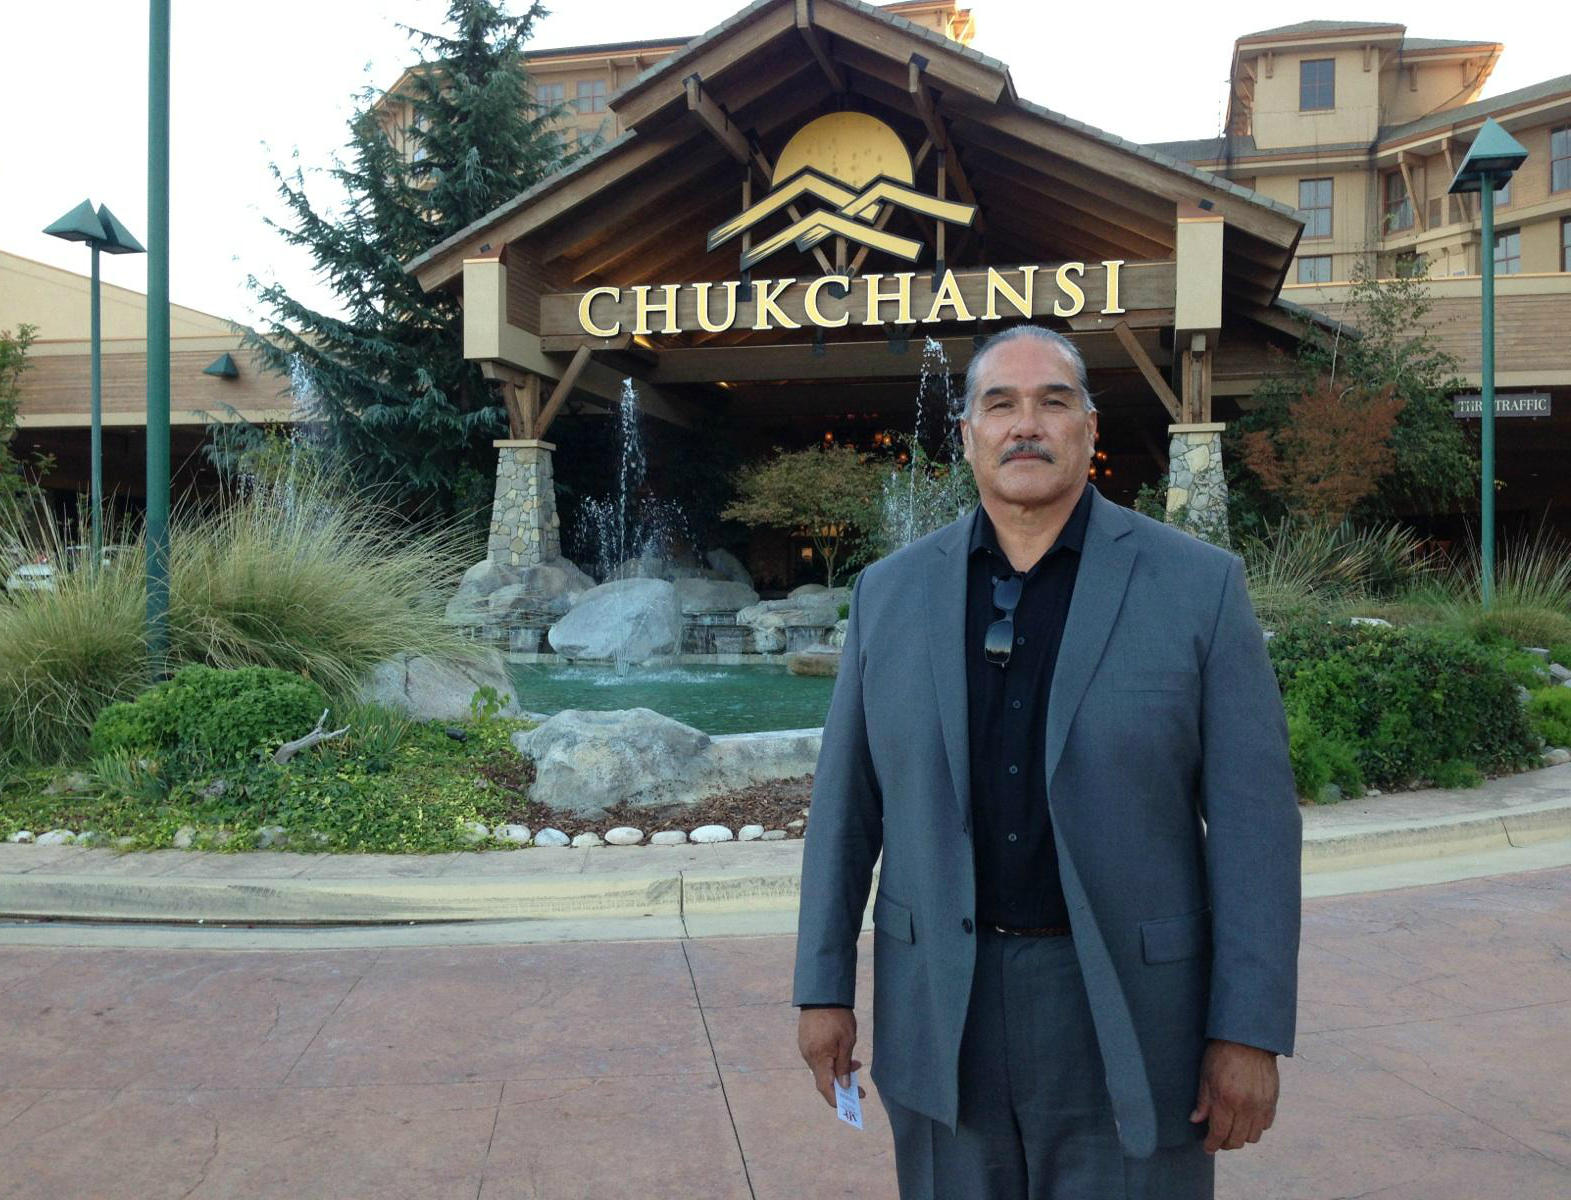 Chachansi casino in fresno casino hotel in san diego